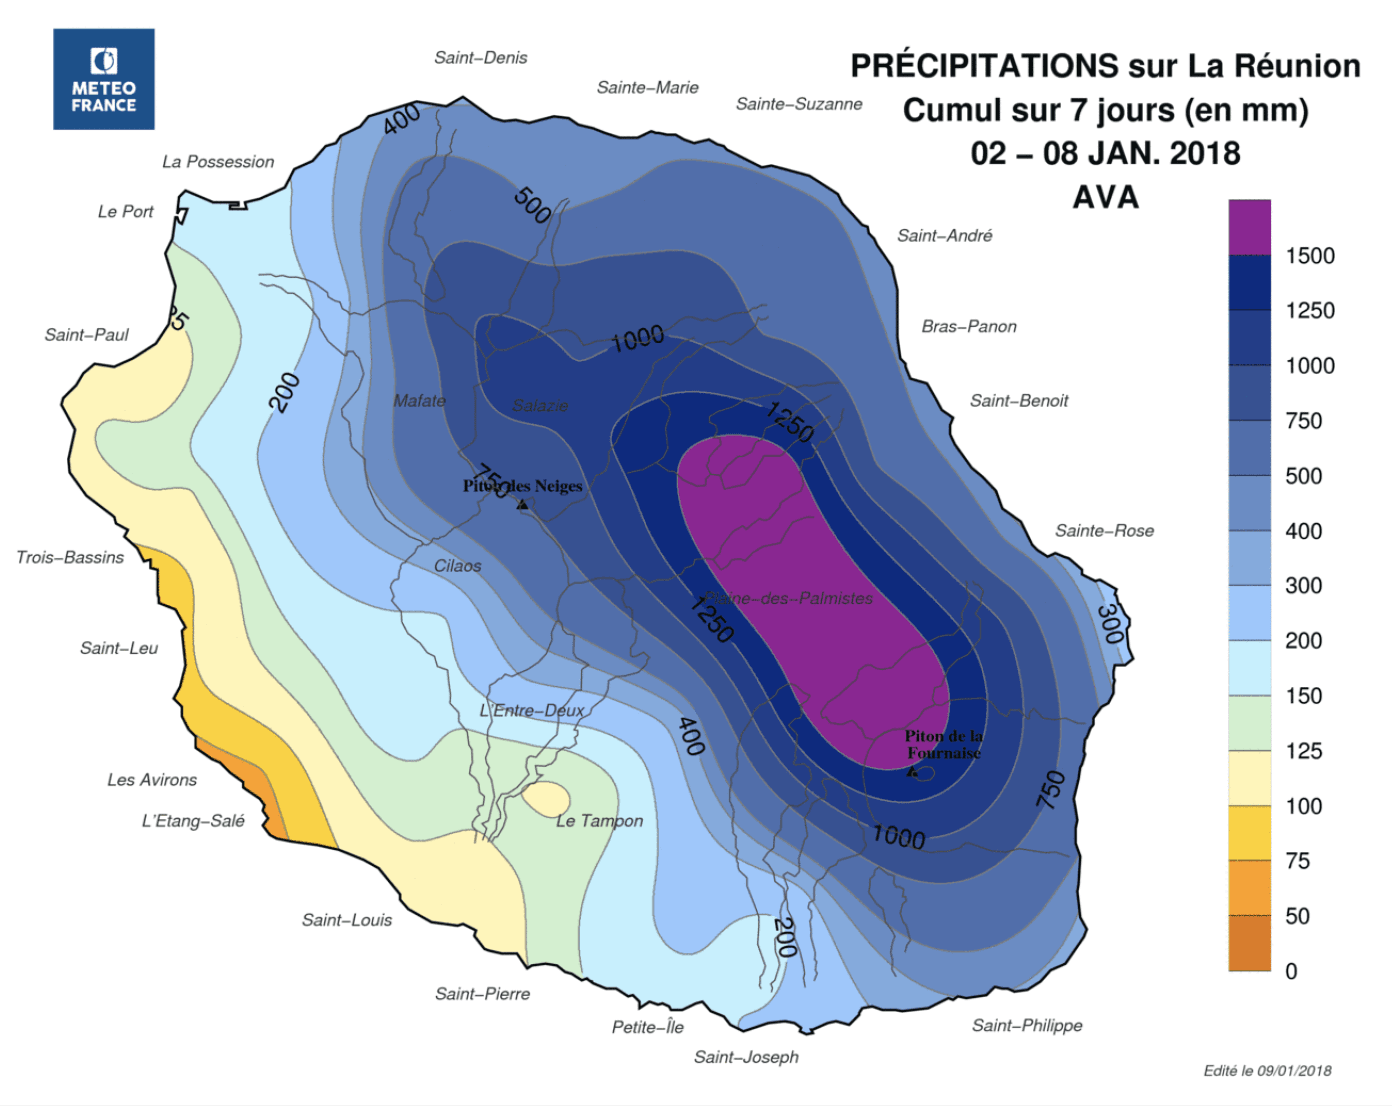 Precipitations-Réunion-AVA